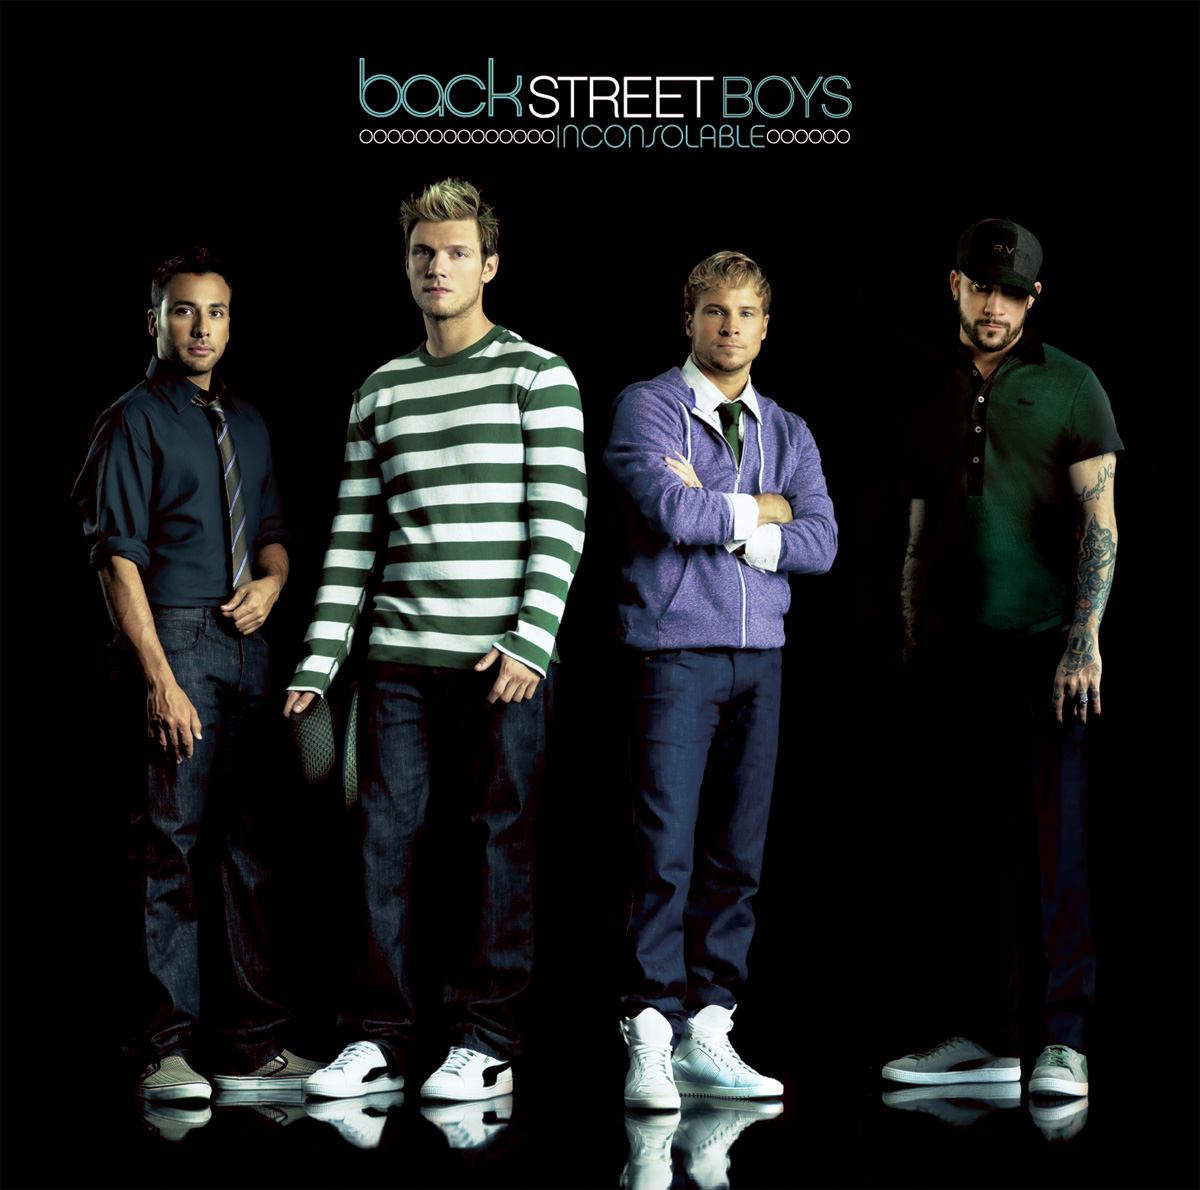 backstreet boys - photo #18